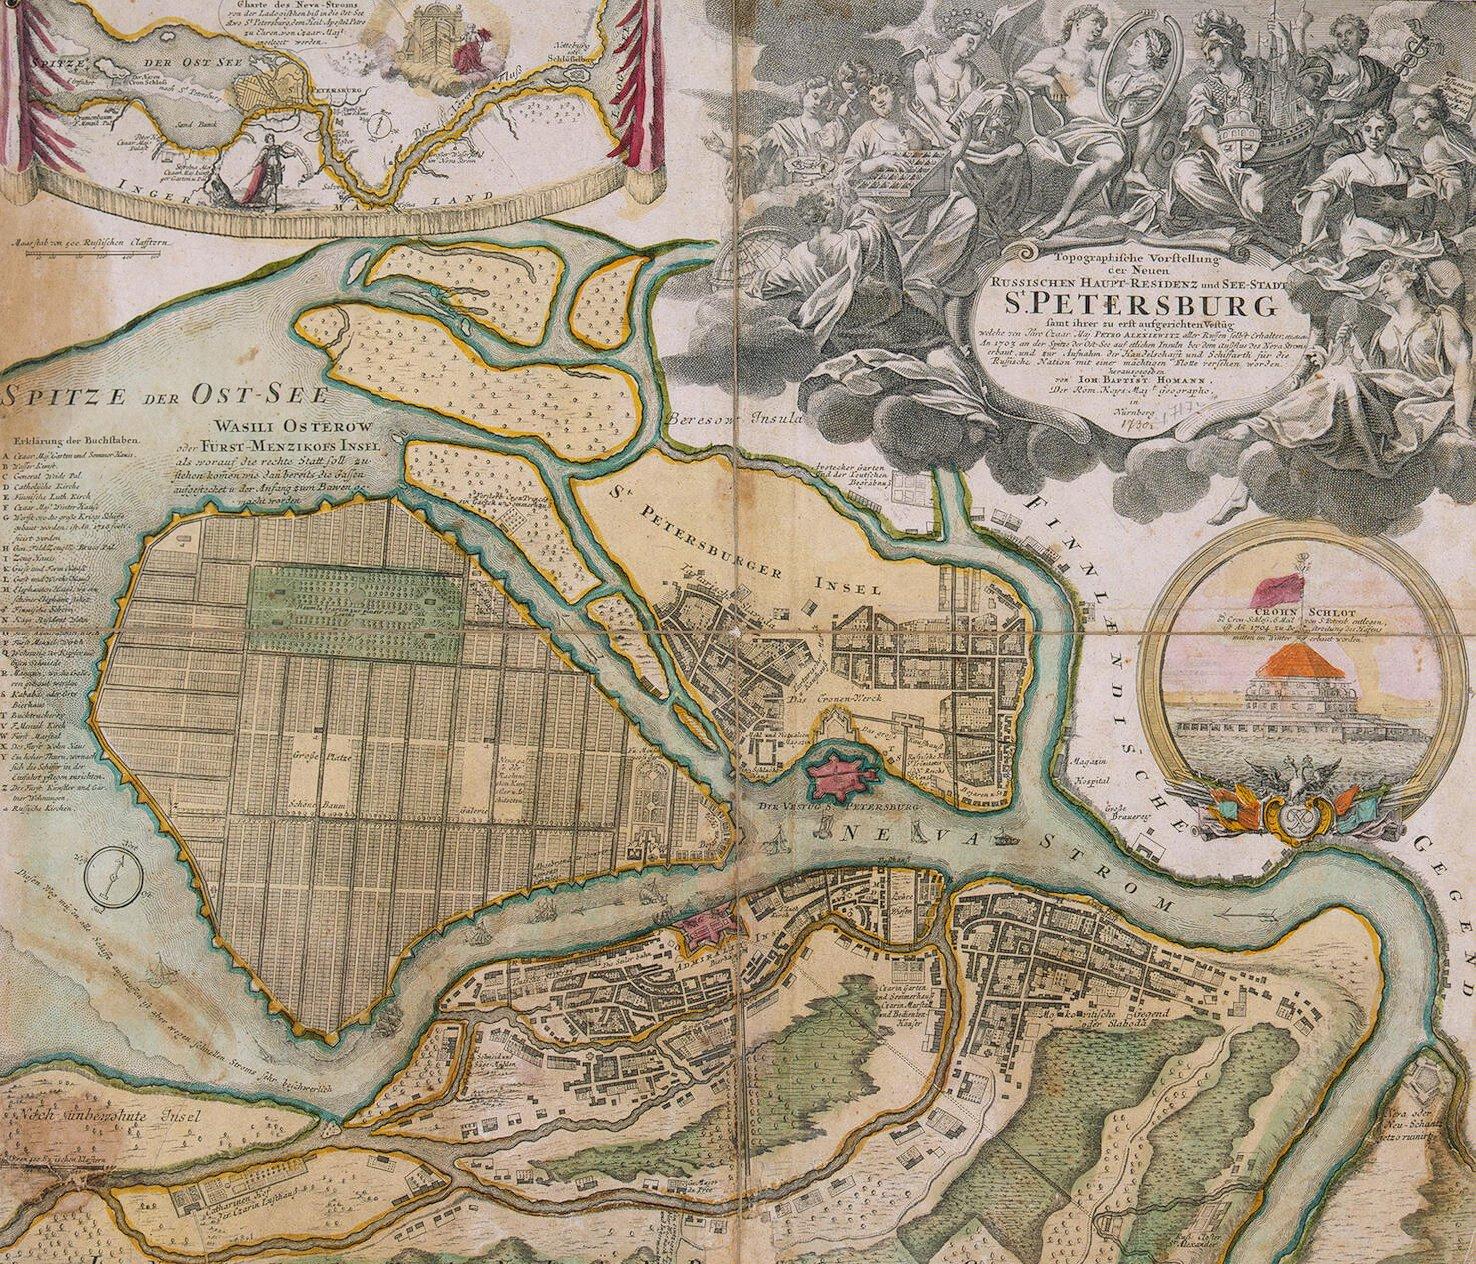 План города с каналами Васильевского острова. Д. Трезини, 1720. wikipedia